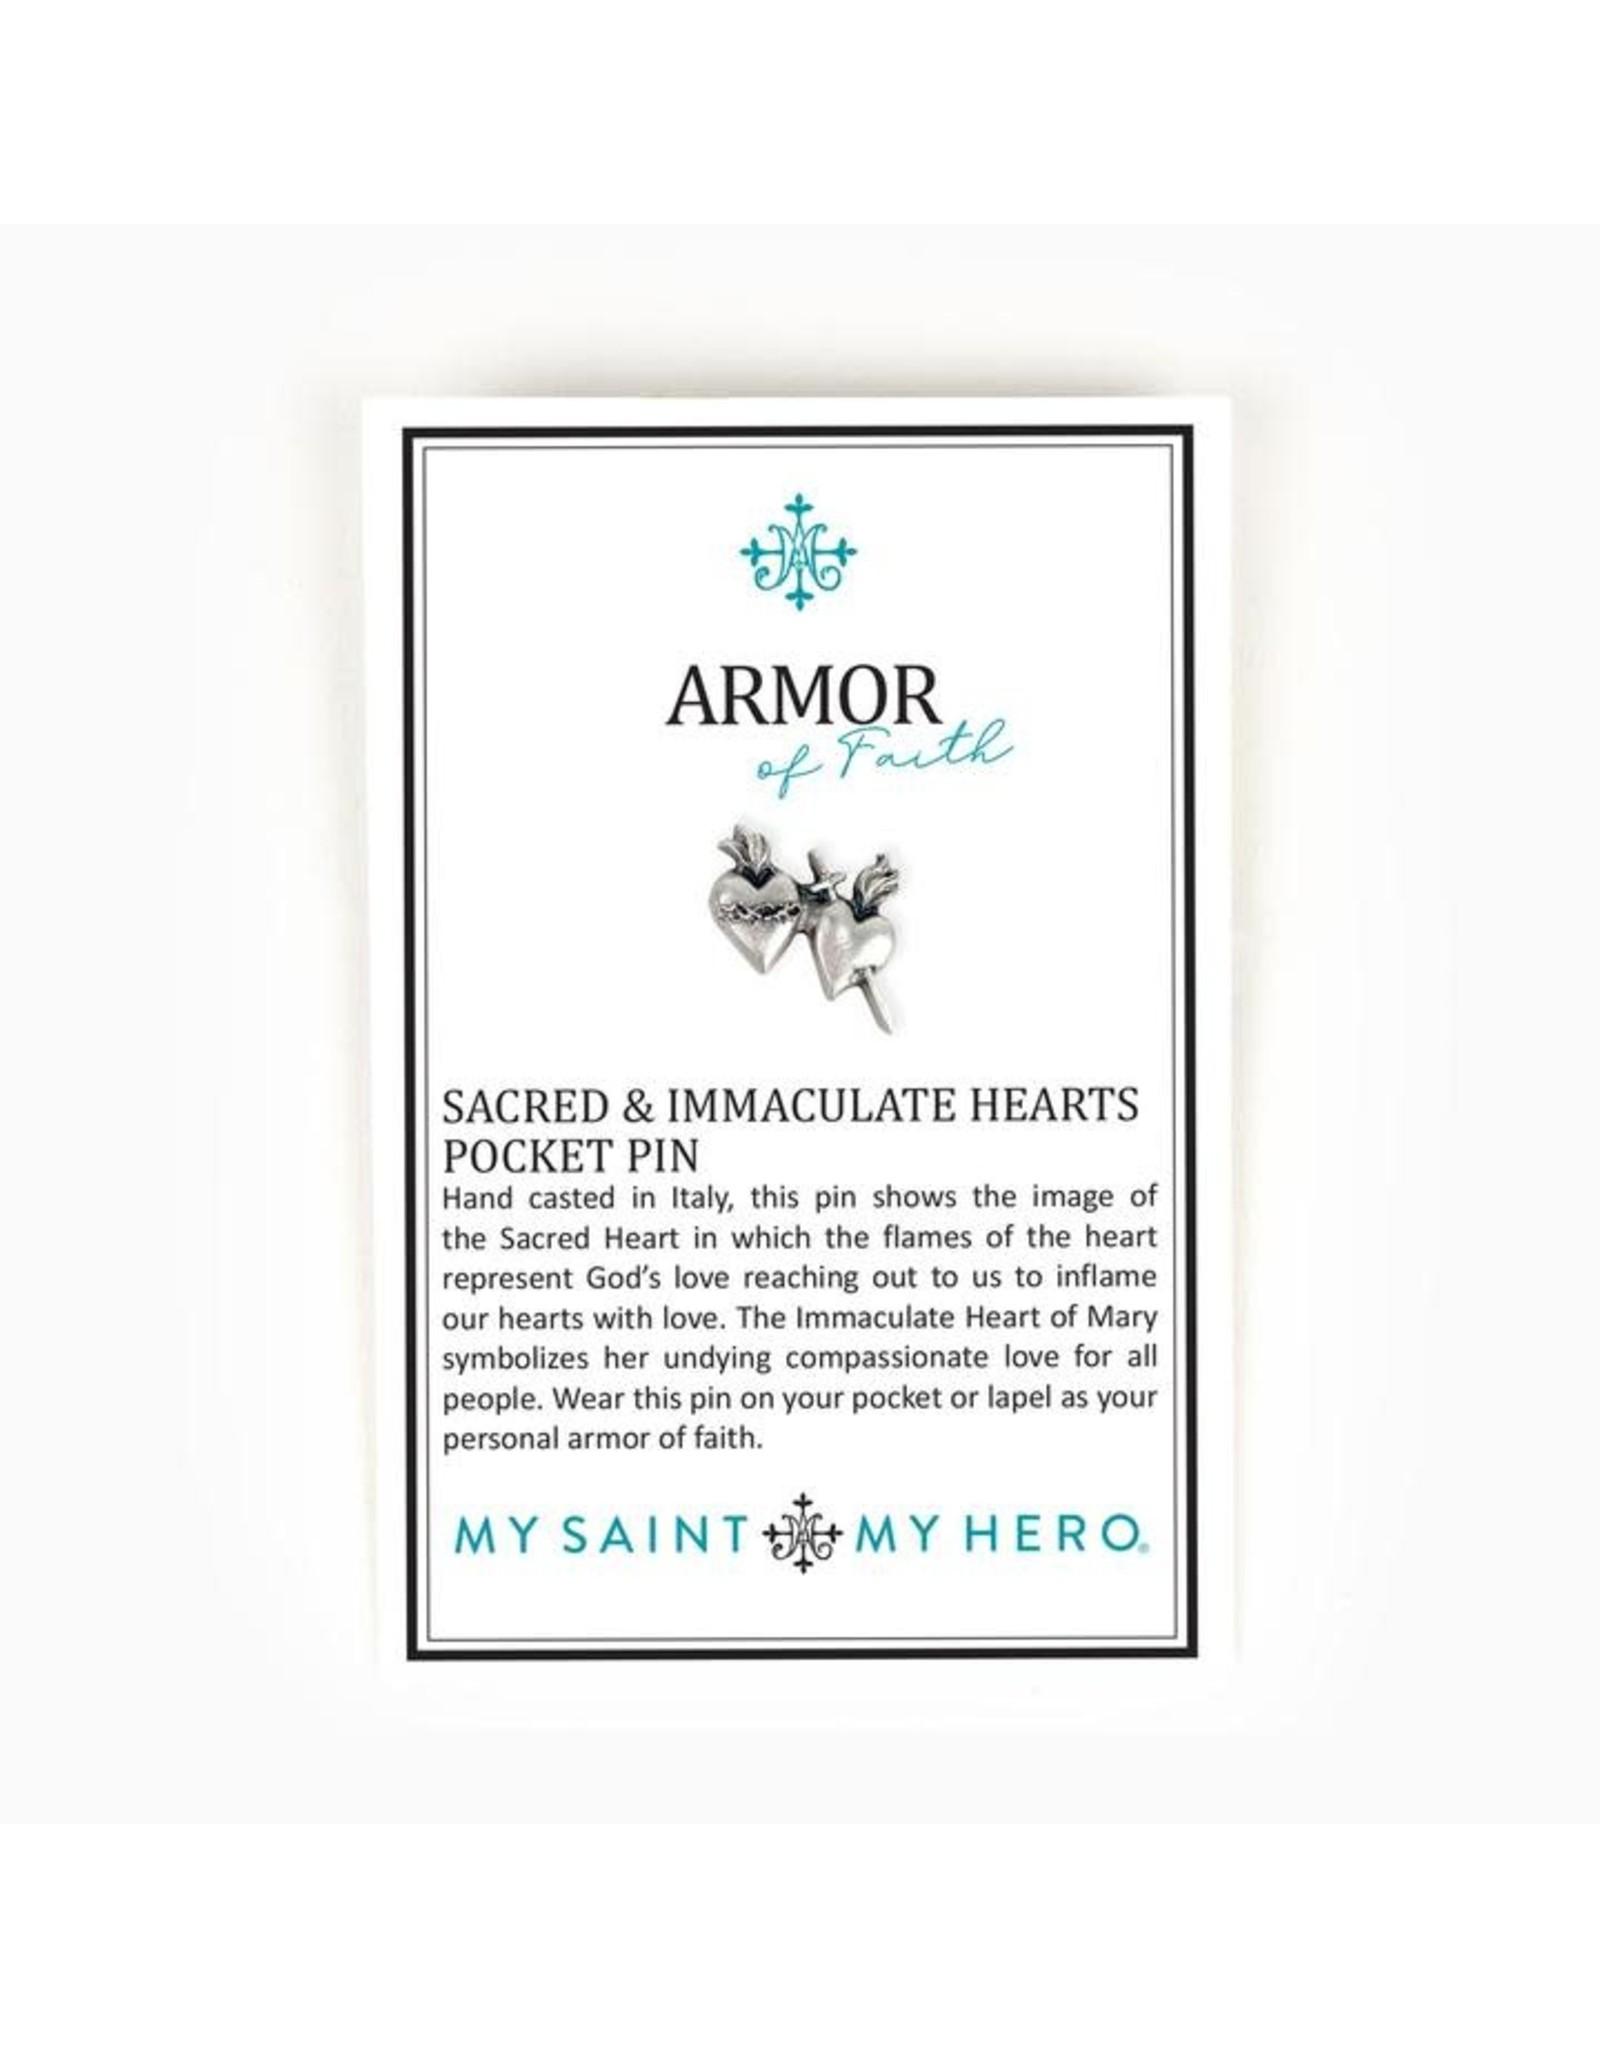 My Saint My Hero Armor of Faith Sacred and Immaculate Hearts Pocket Pin